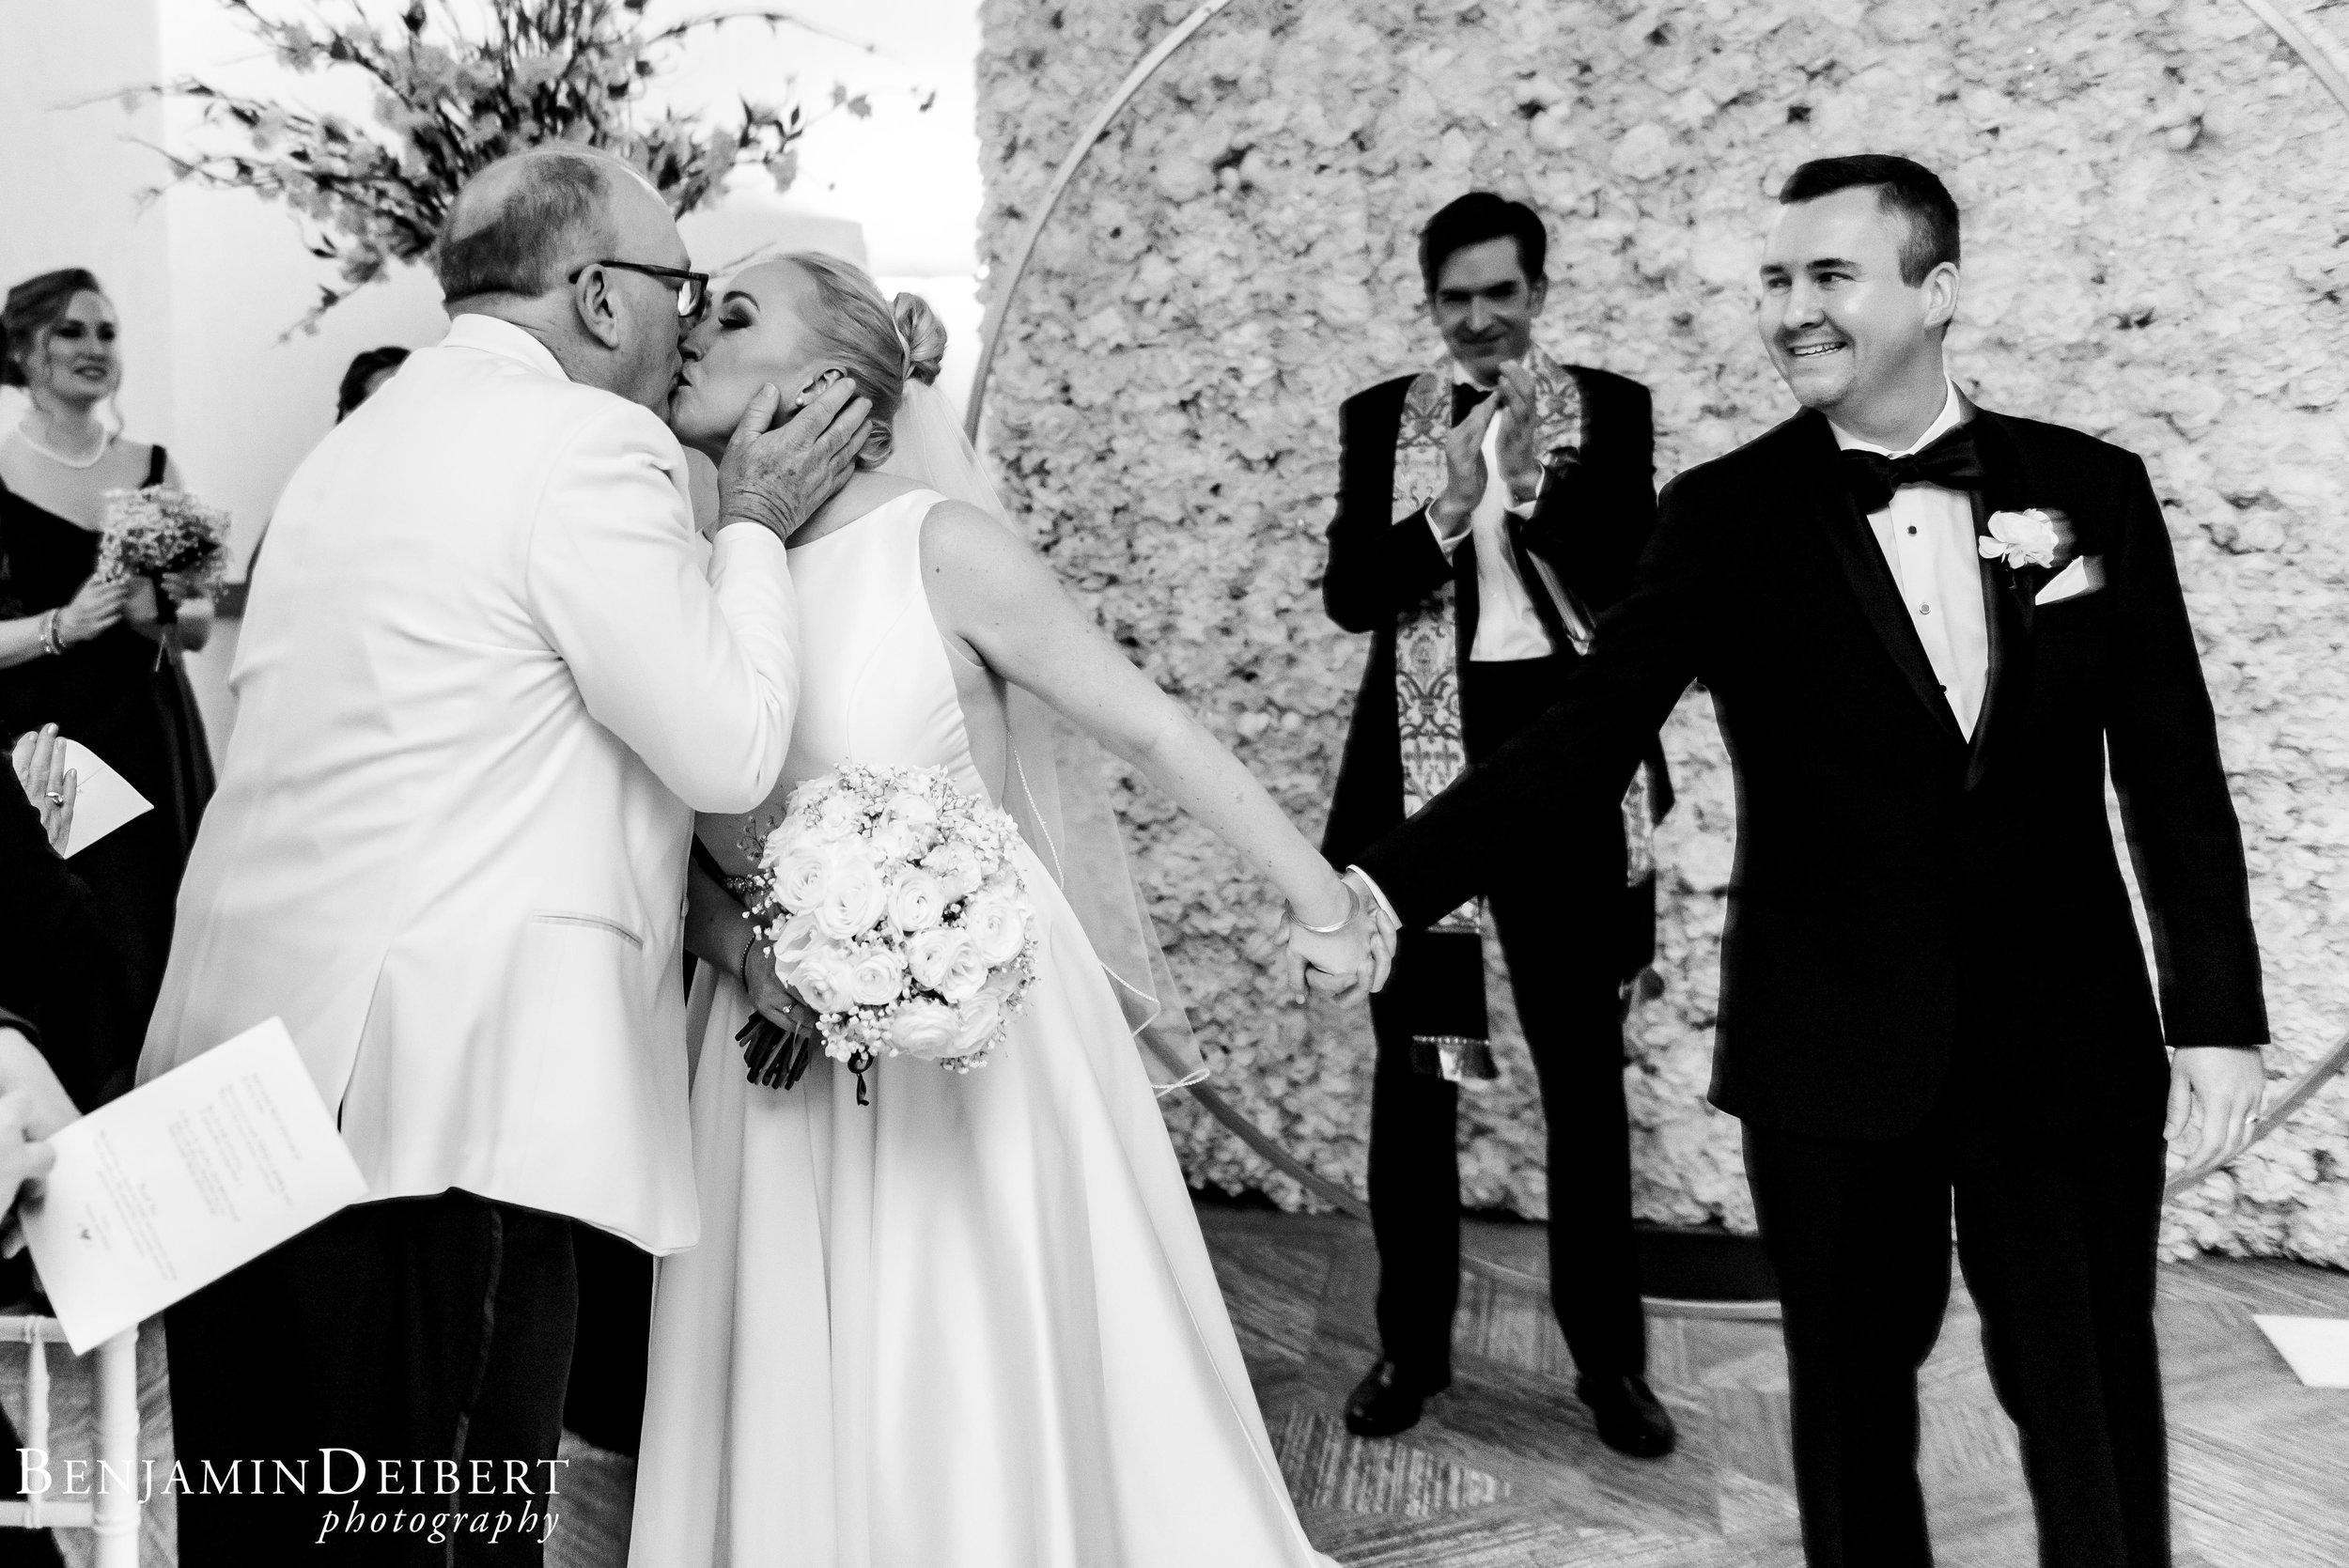 PatriceandAdam_TheLucy__Cescaphe_Wedding-44.jpg